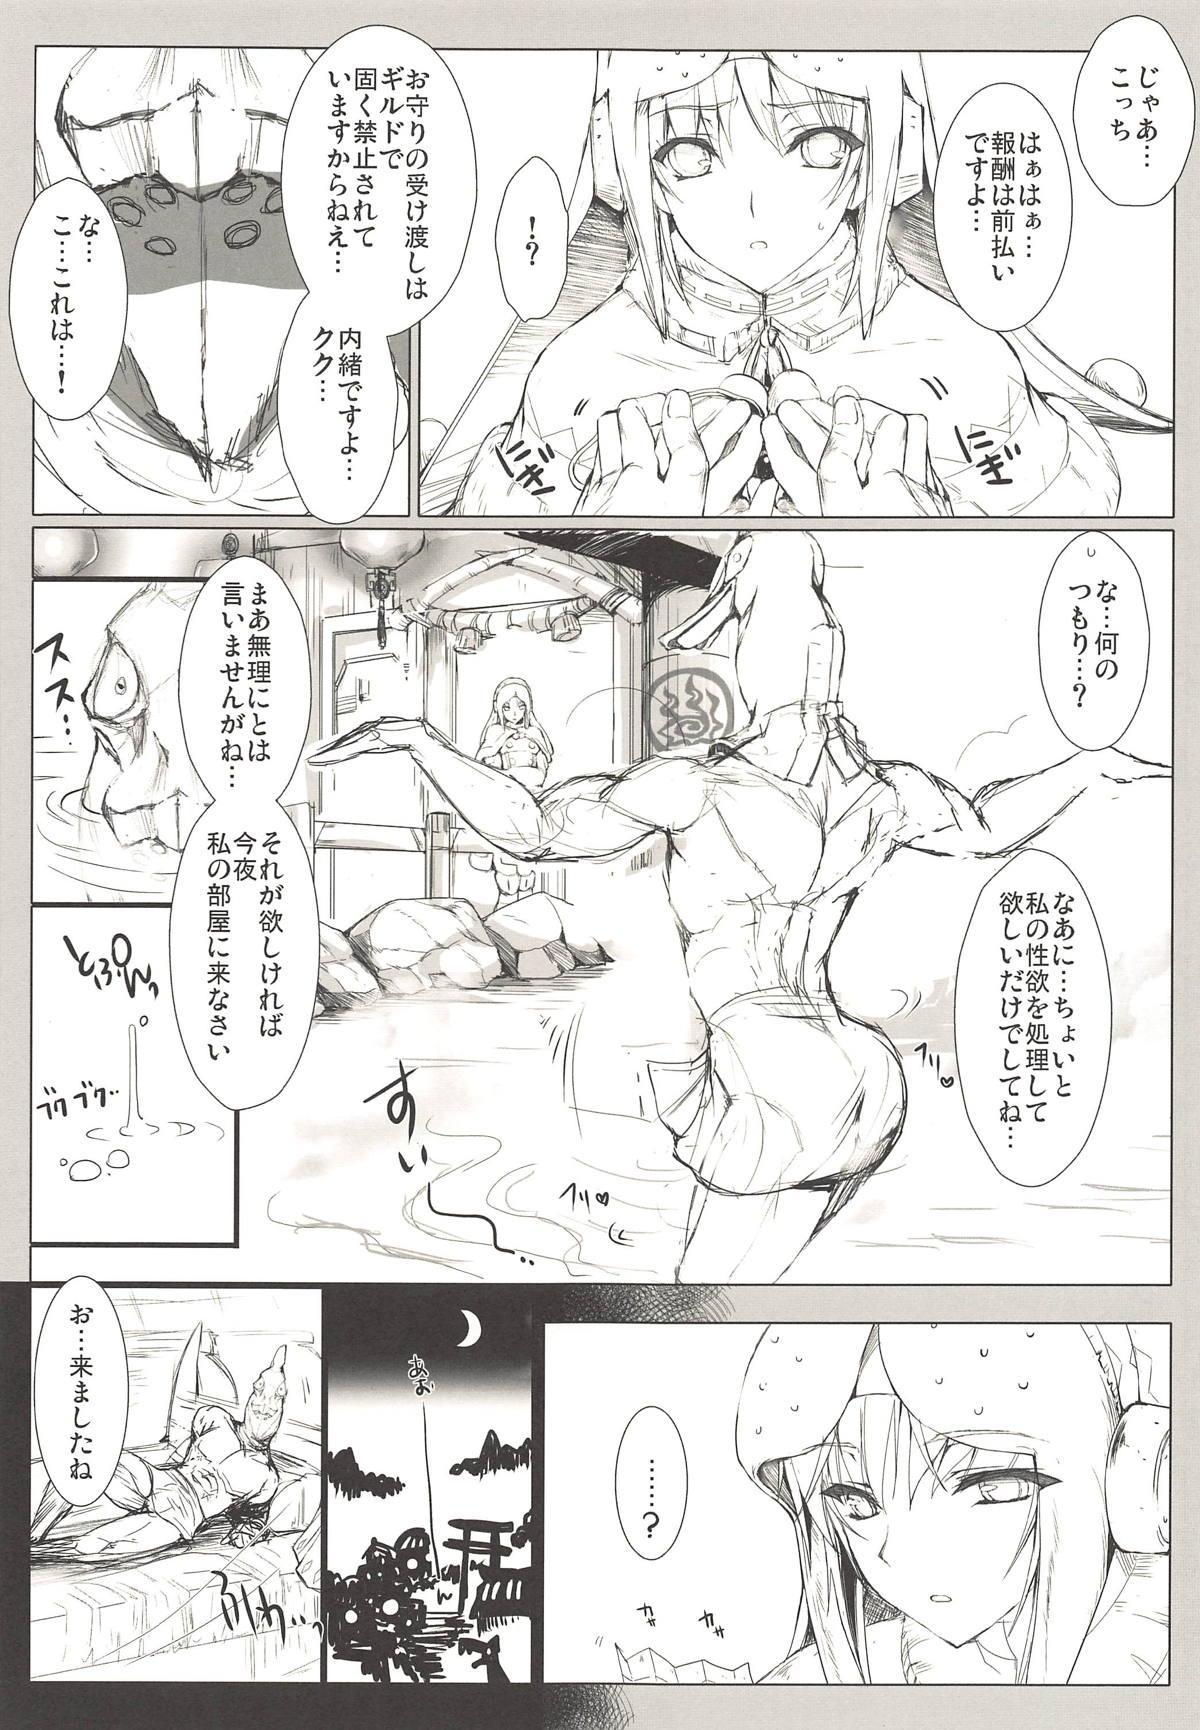 Monhan no Erohon G3 11→14+Juuhi+Omakebon Soushuuhen 51